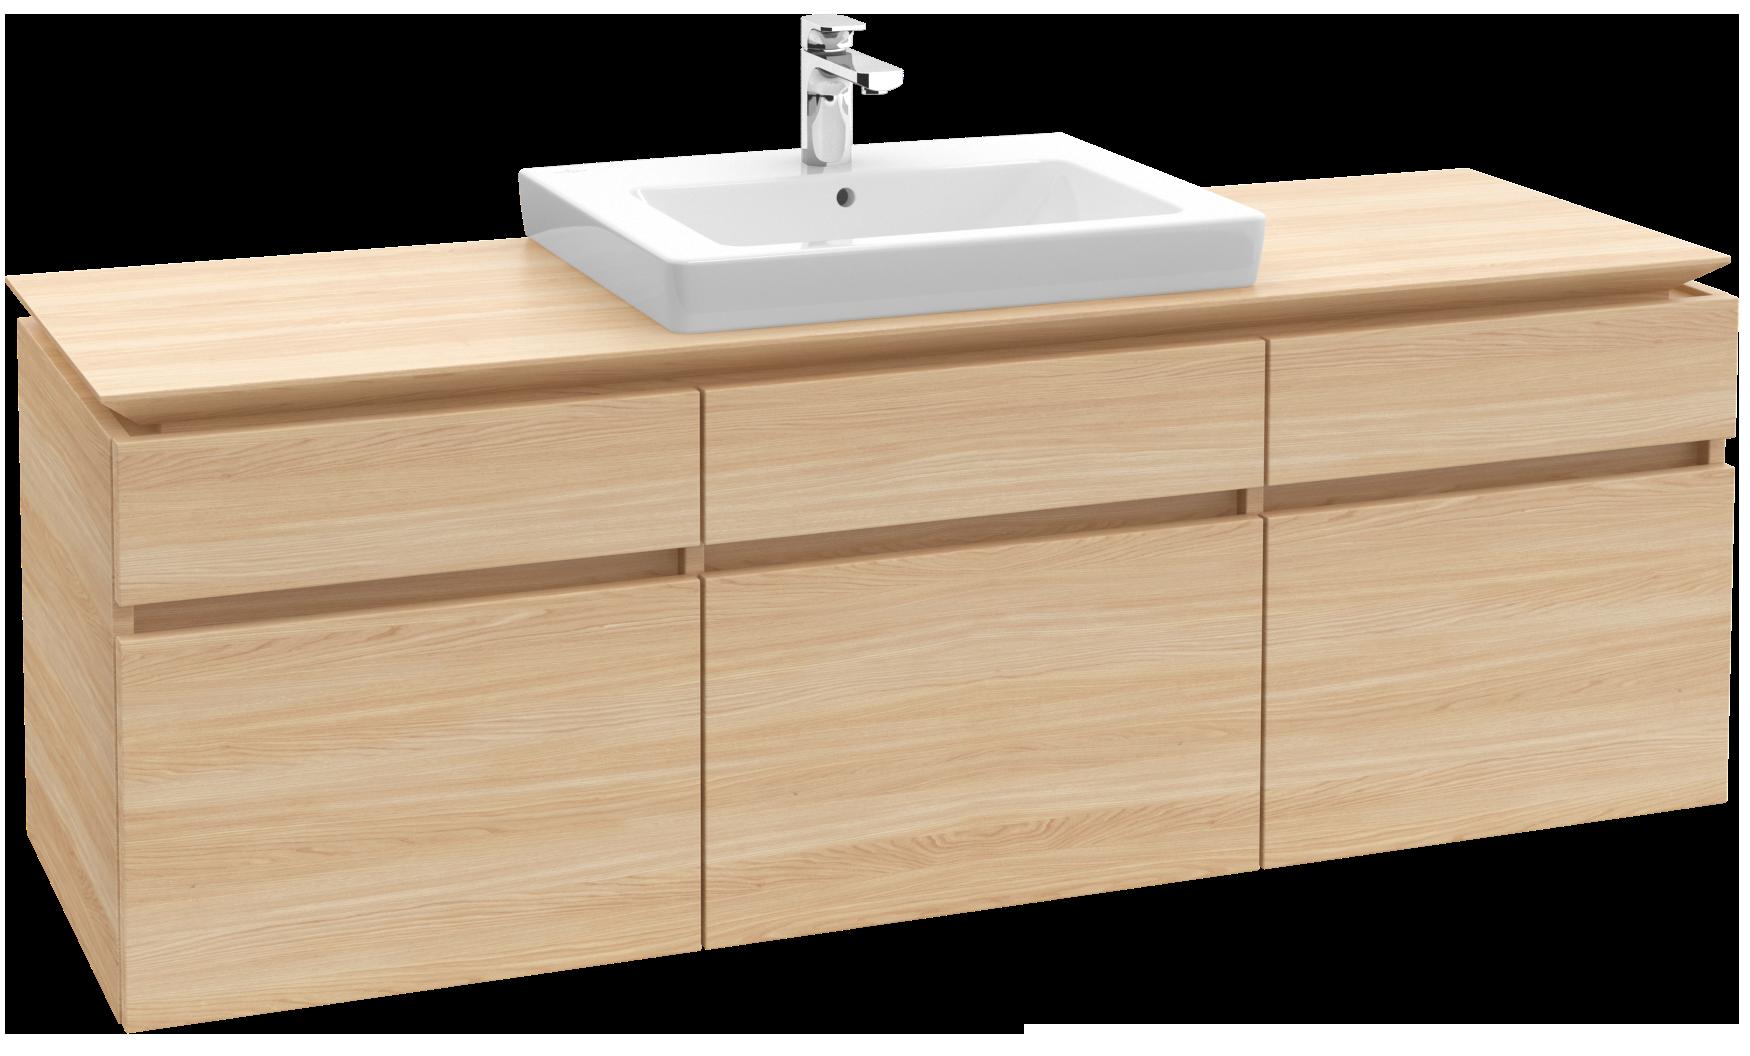 Legato meuble sous lavabo b25400 villeroy boch - Meuble de salle de bain villeroy et boch ...